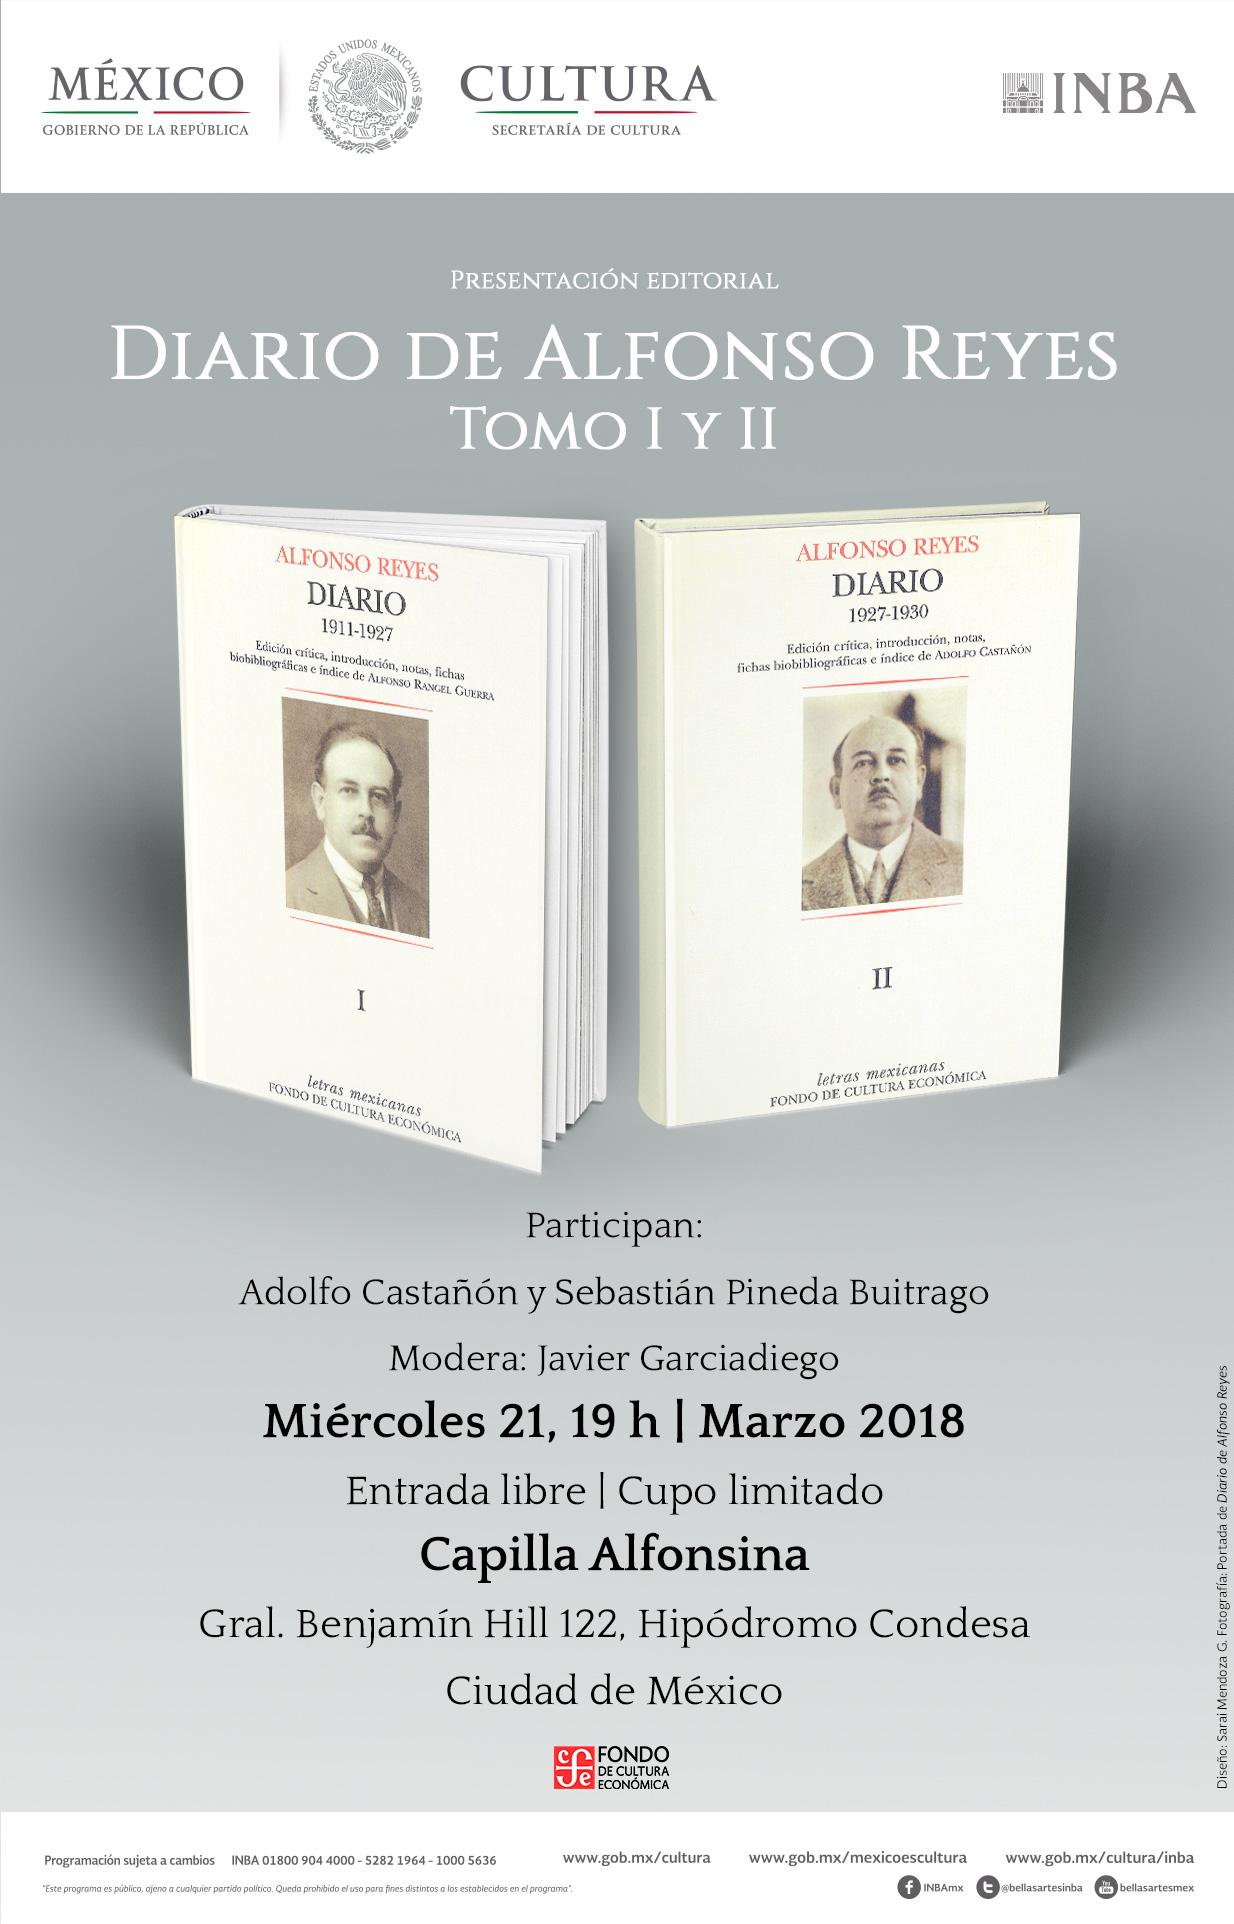 PE_Diario-de-Alfonso-Reyes_inv